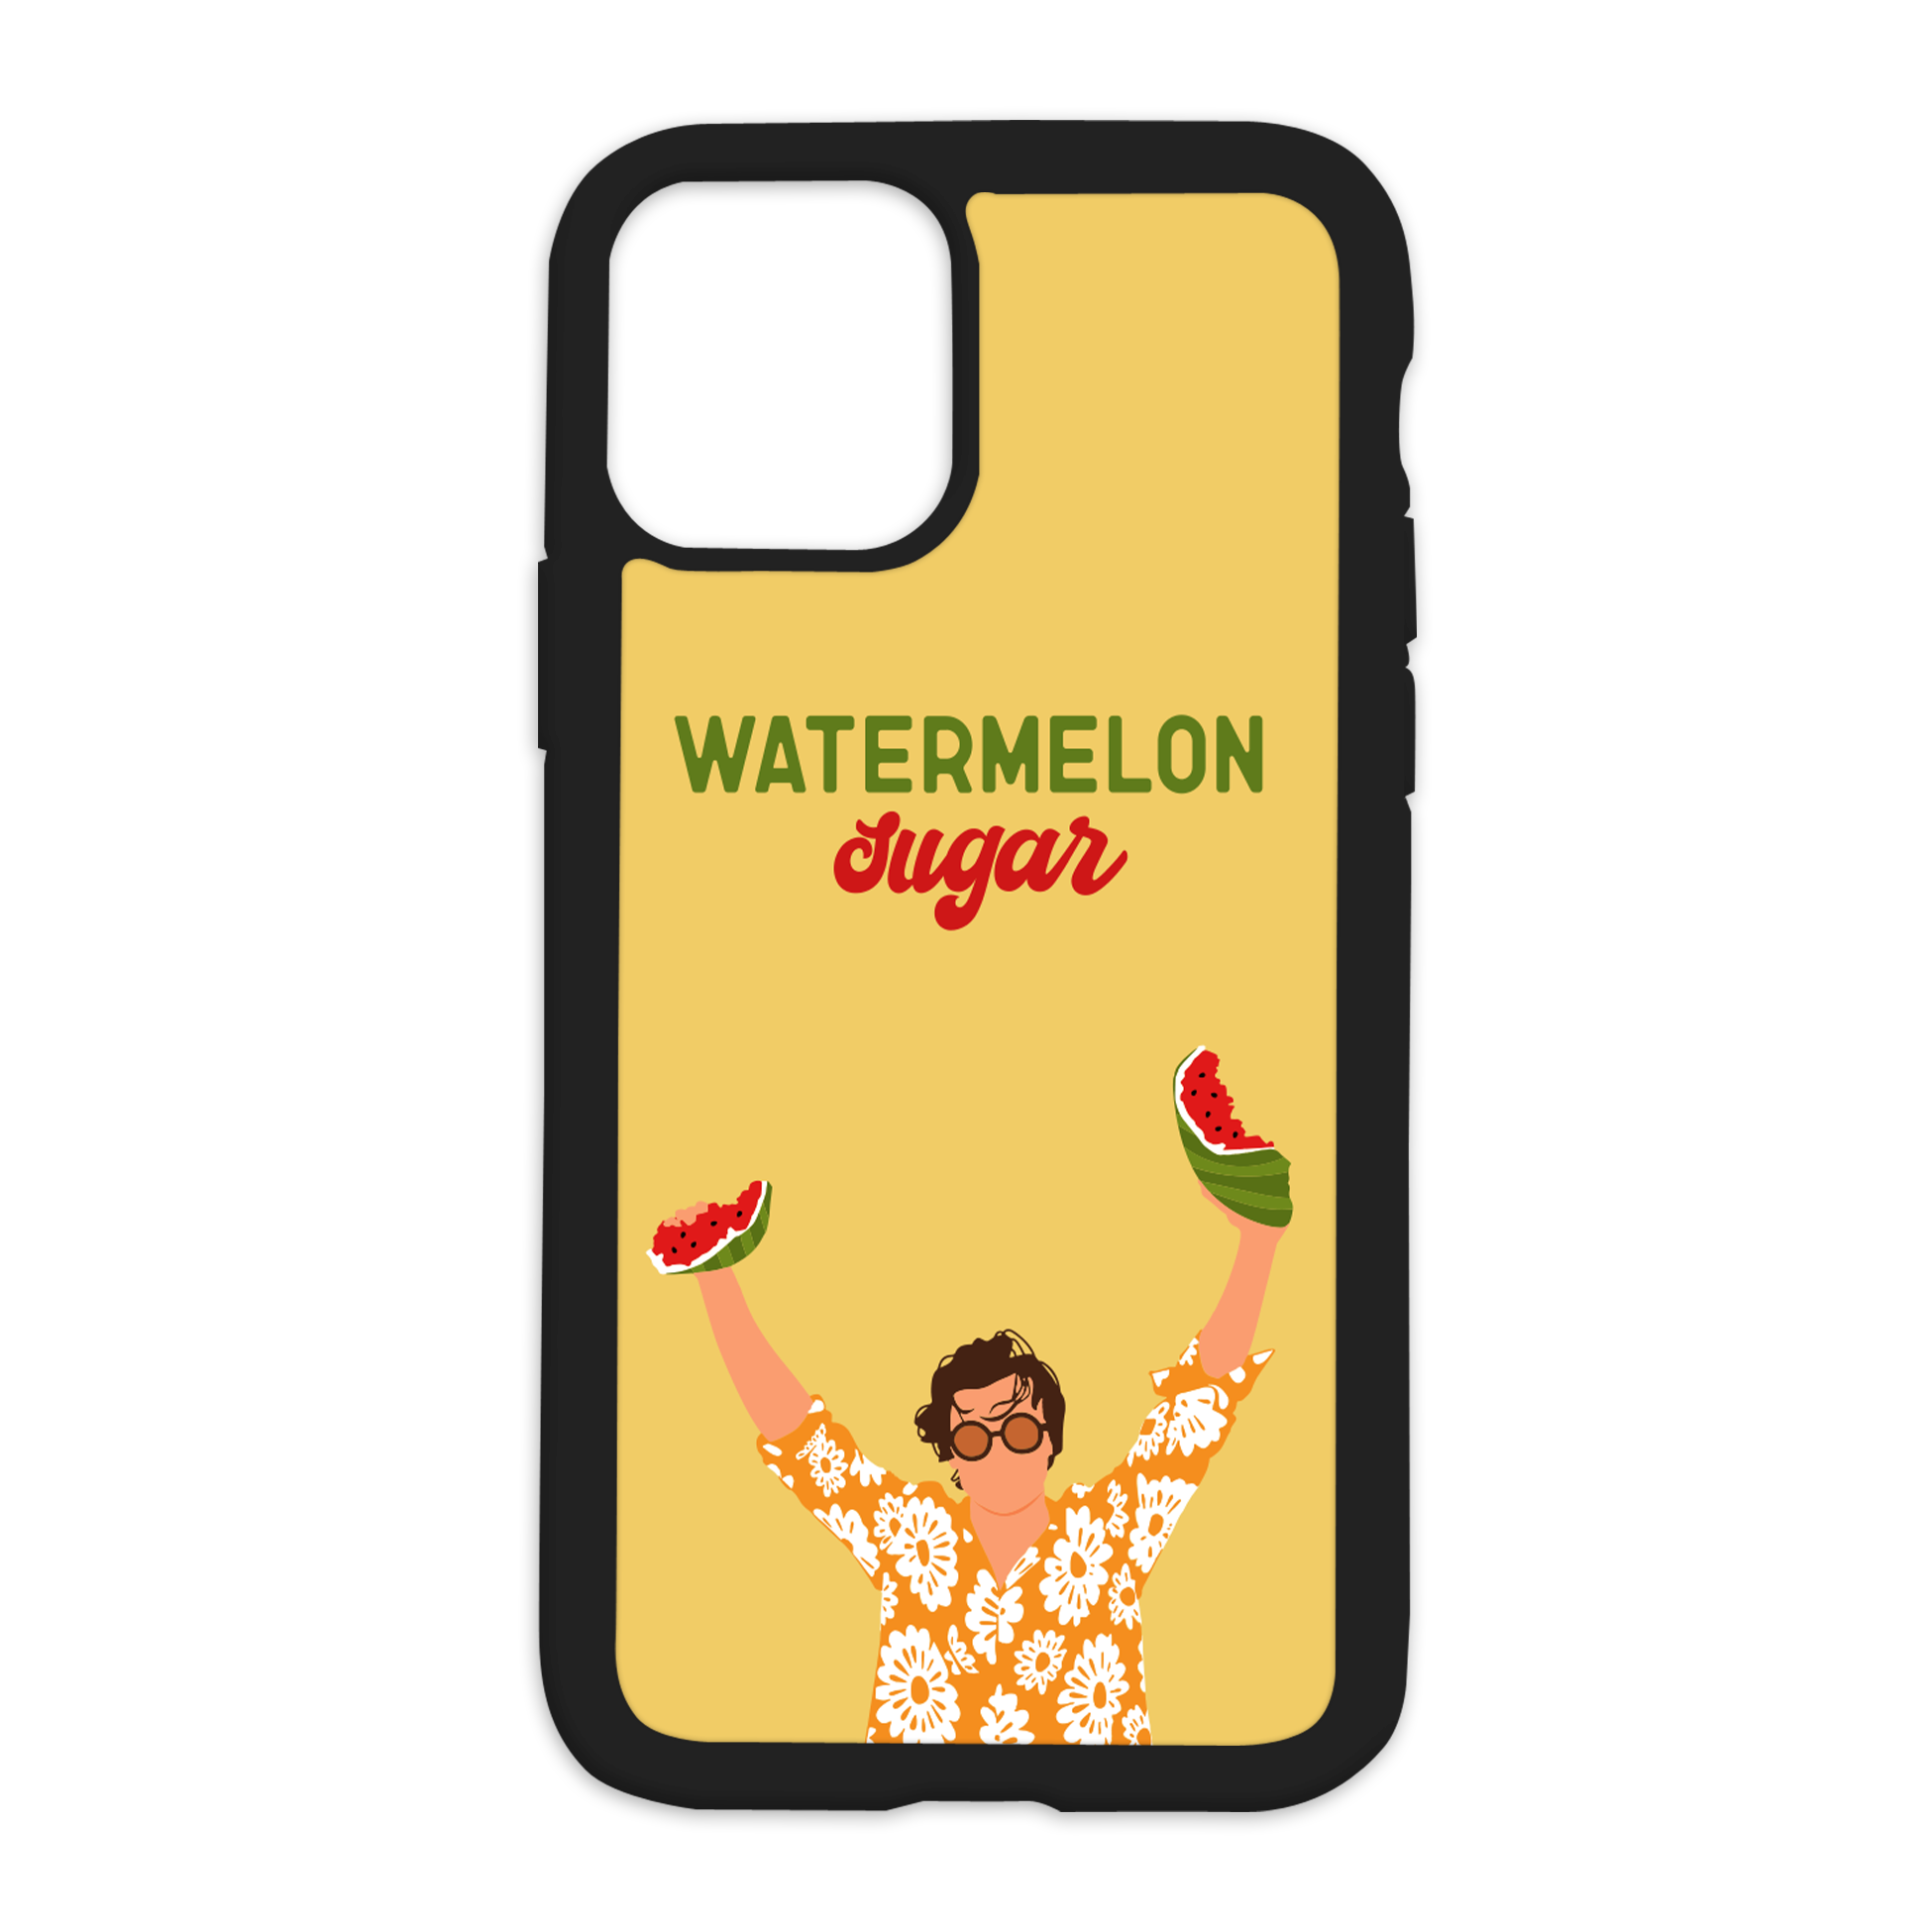 Harry Styles Design On Black Phone Case - 12/12Pro